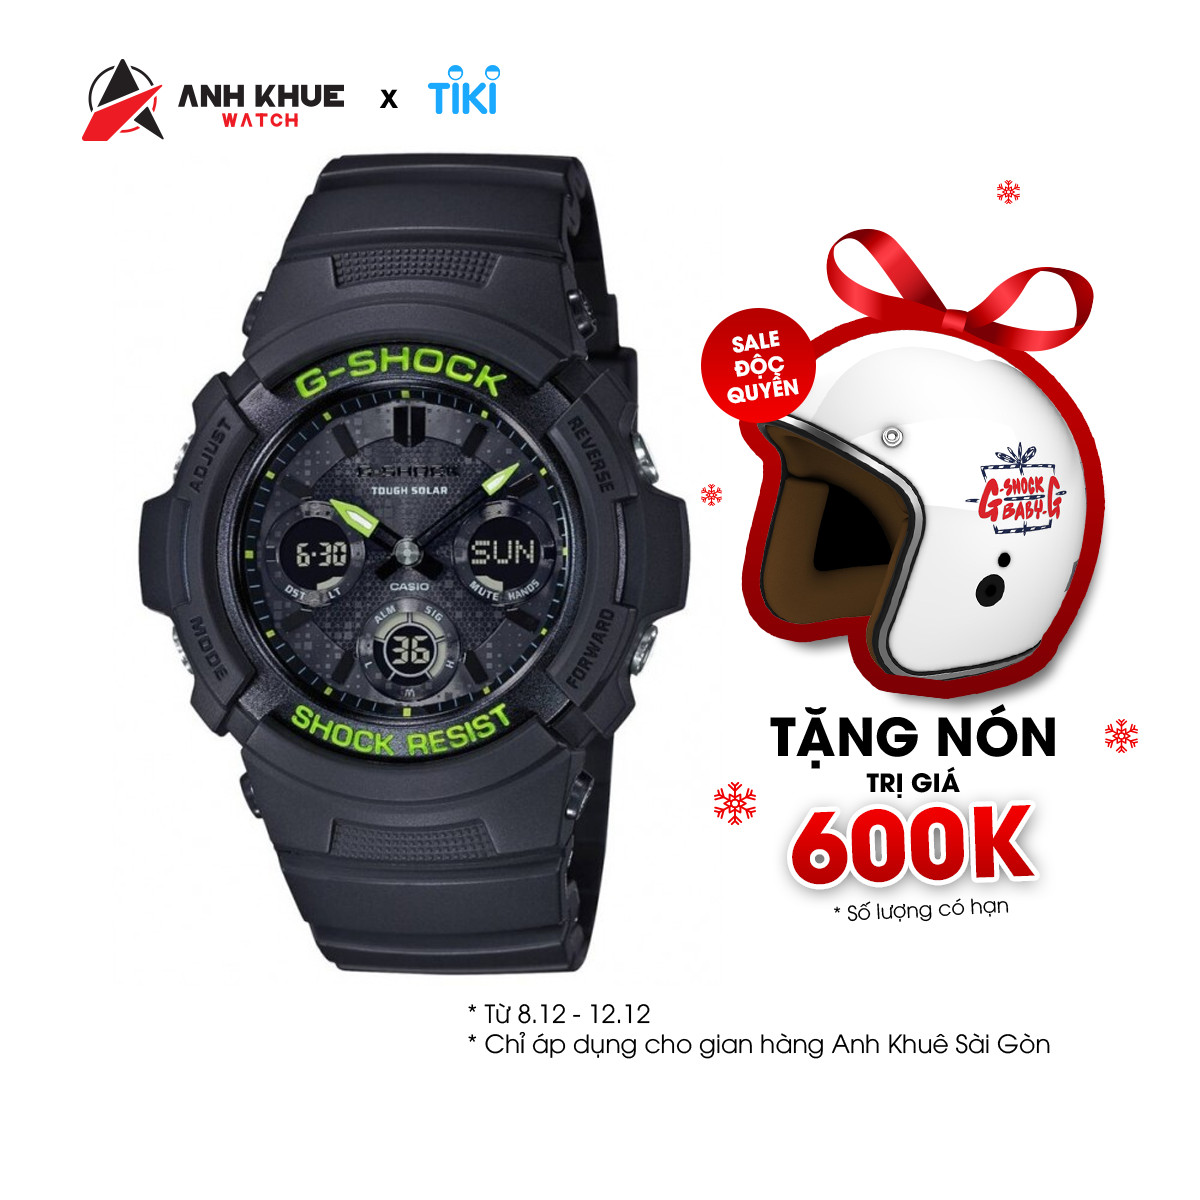 Đồng hồ Casio Nam G Shock AWR-M100SDC-1ADR